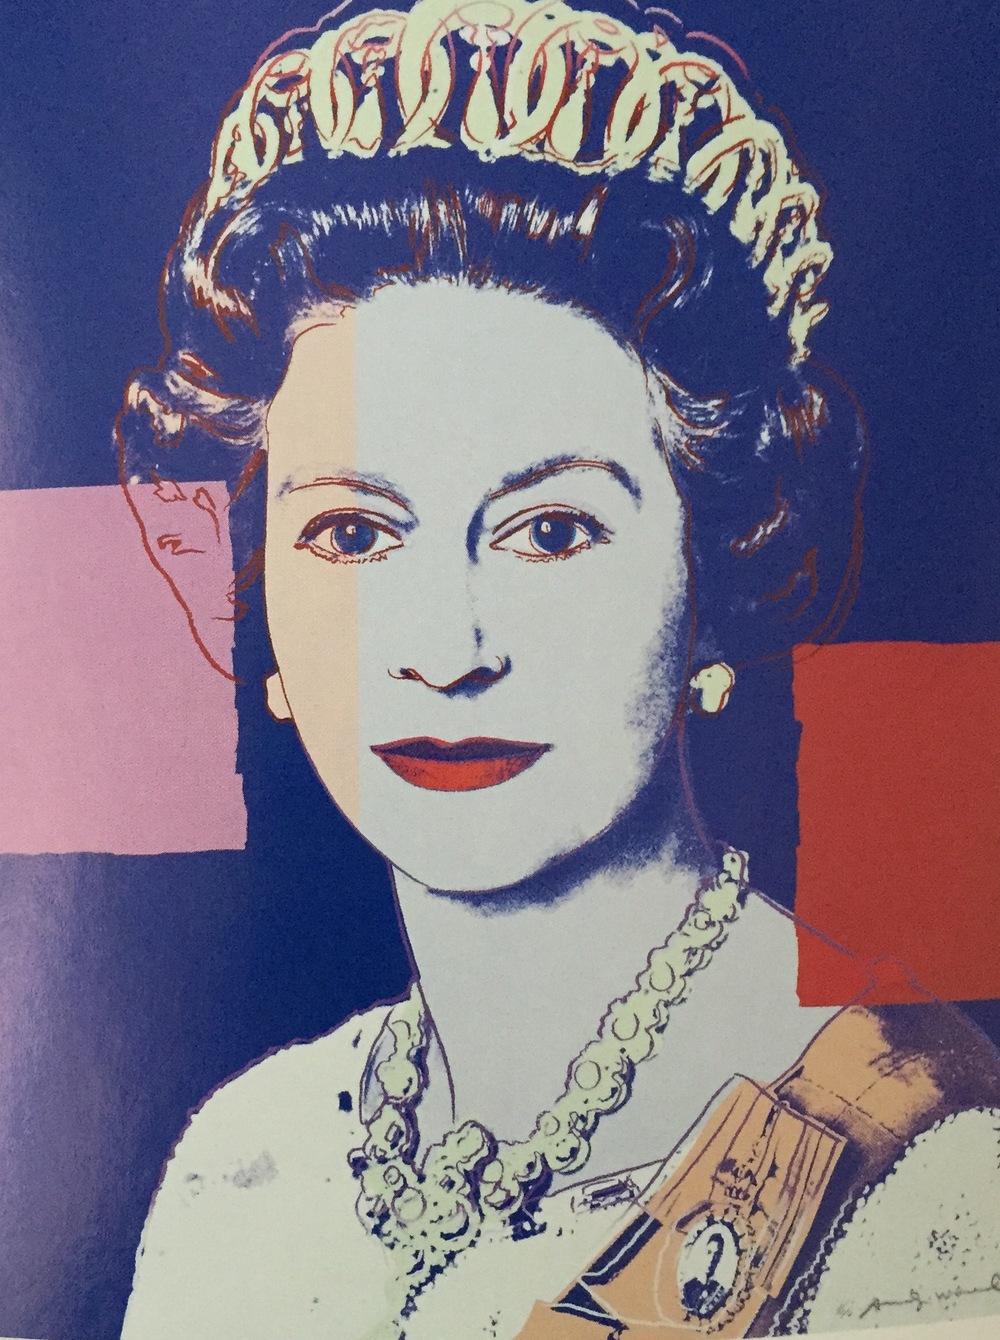 Queen Elizabeth II. b.1926.Andy Warhol, 1985, Silkscreen print, 1000 x 800mm.National Portrait Galery (NPG 5882(2))